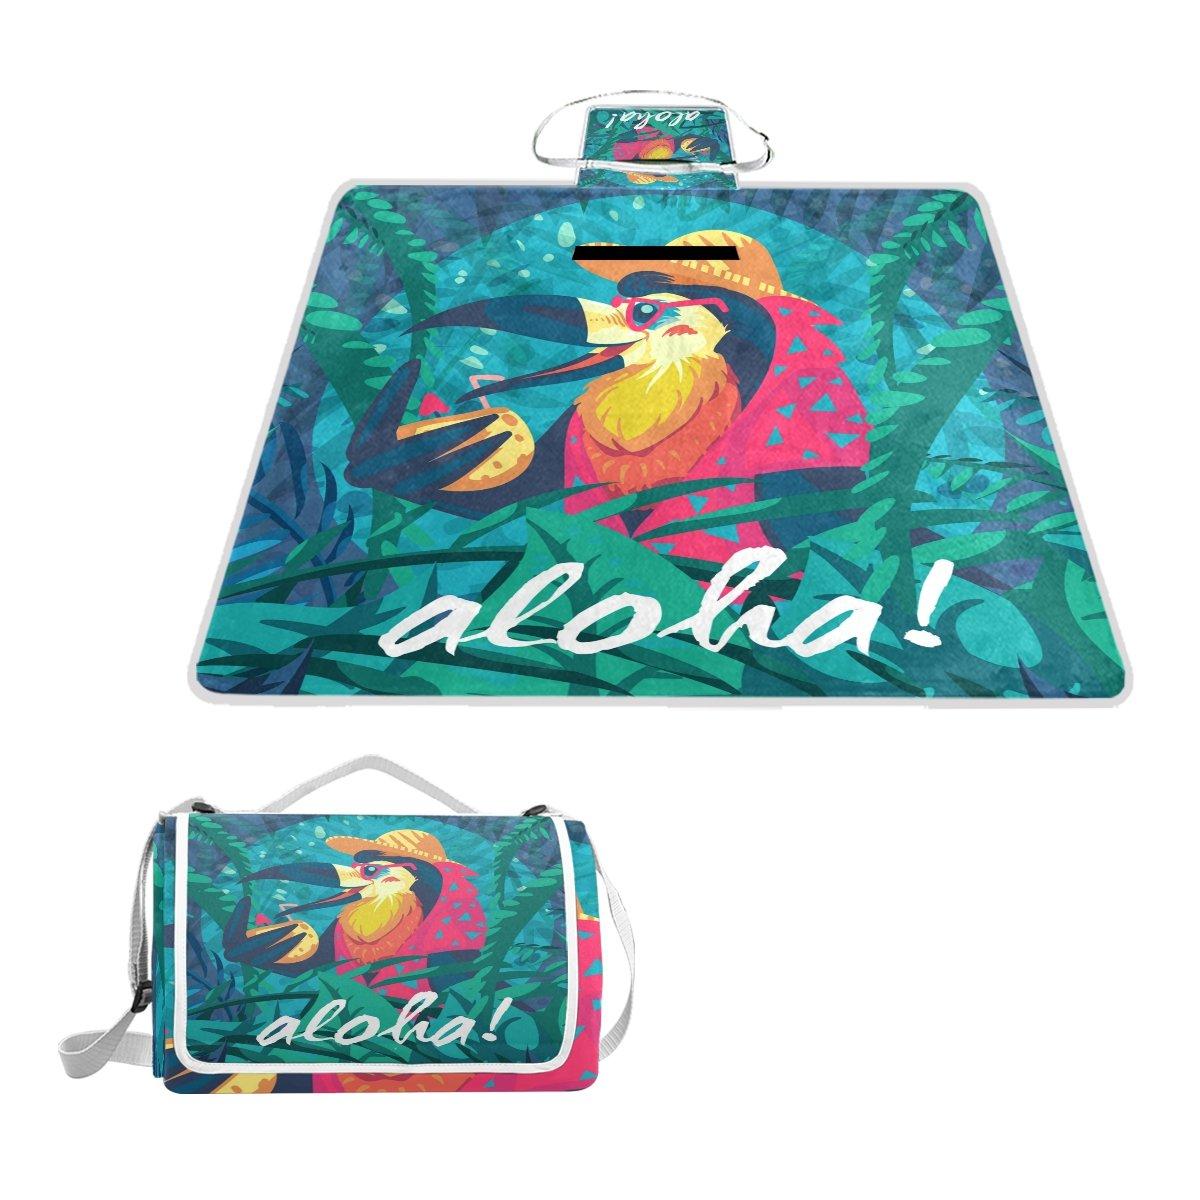 Fengye Funny Hawaiian Bird Outdoor Handy Picnic Blanket Mat Cover Waterproof Grass Carpets Foldable Tote bag Camping Hiking Beach